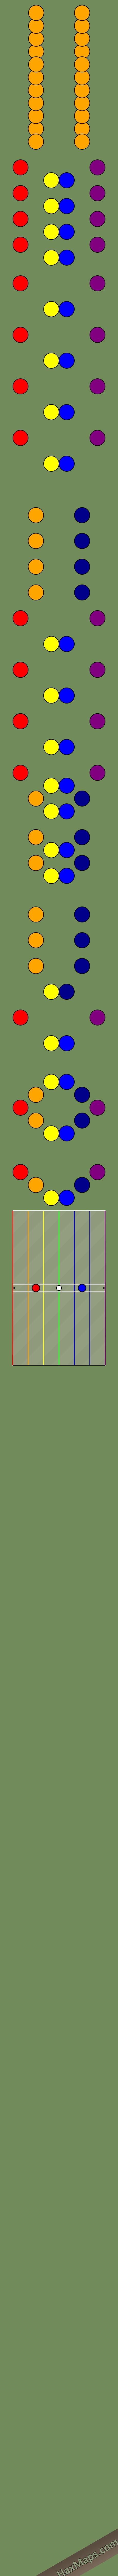 hax ball maps | Rhythm Haxball normal 1